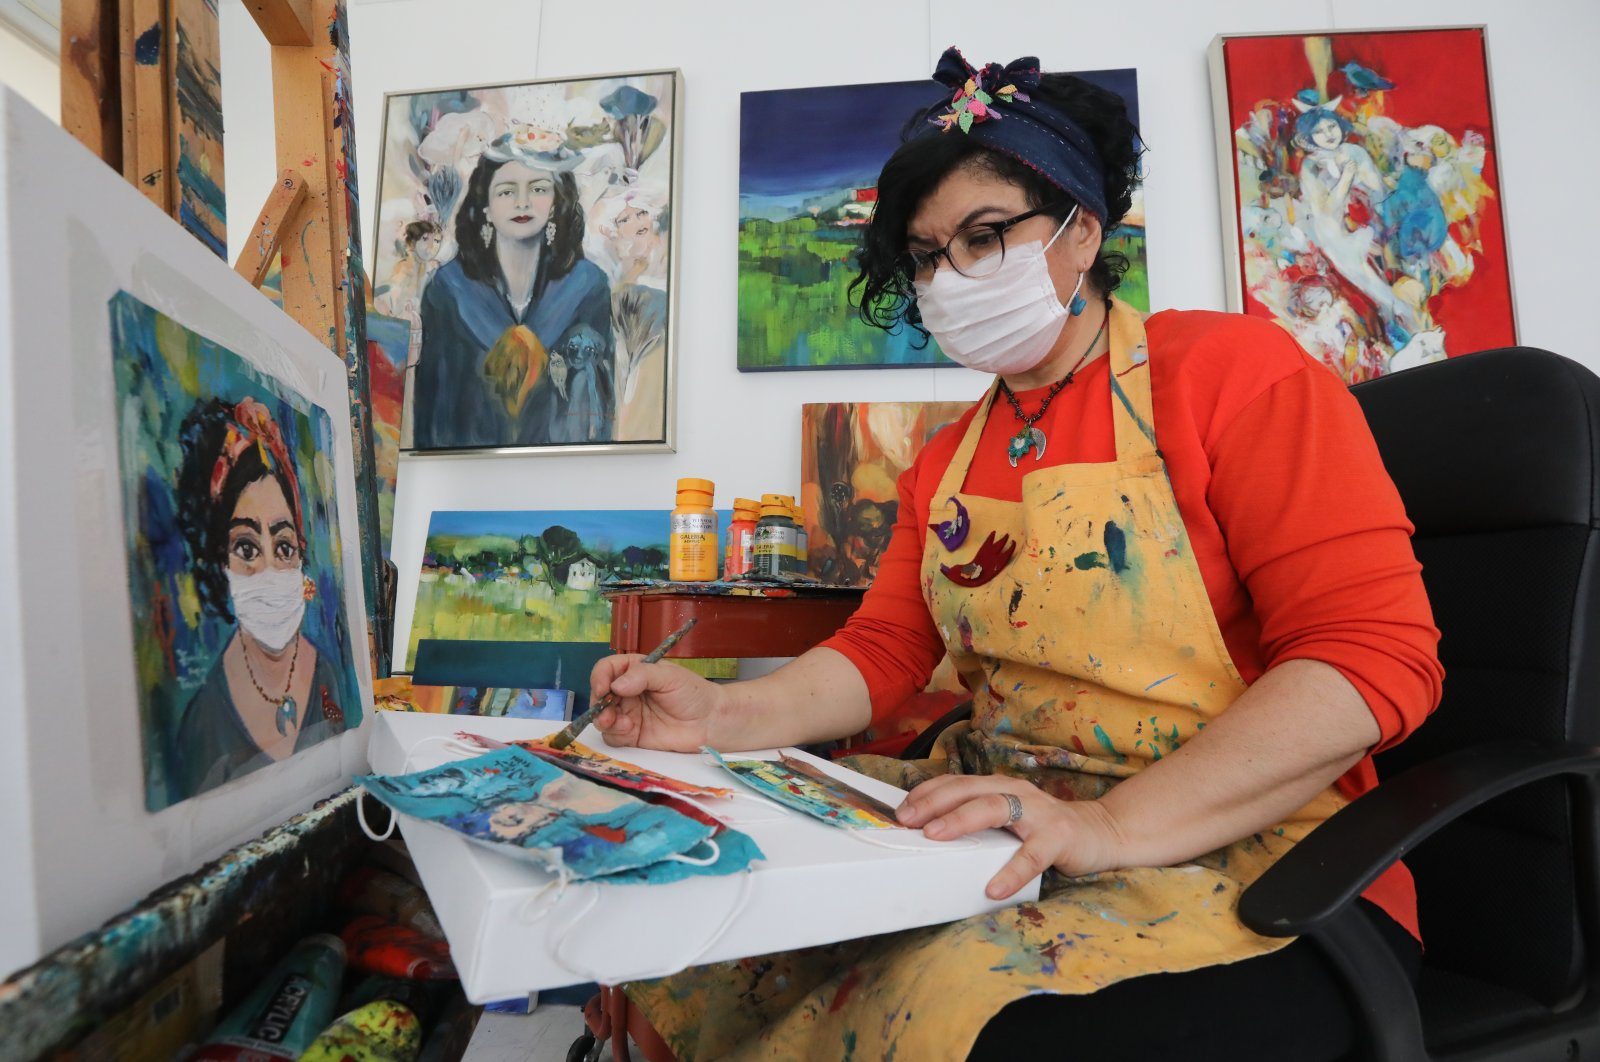 Artist Funda İyce Tuncel paints a face mask at her home during the coronavirus pandemic, Ankara, Turkey, April 26, 2020. (AA Photo)